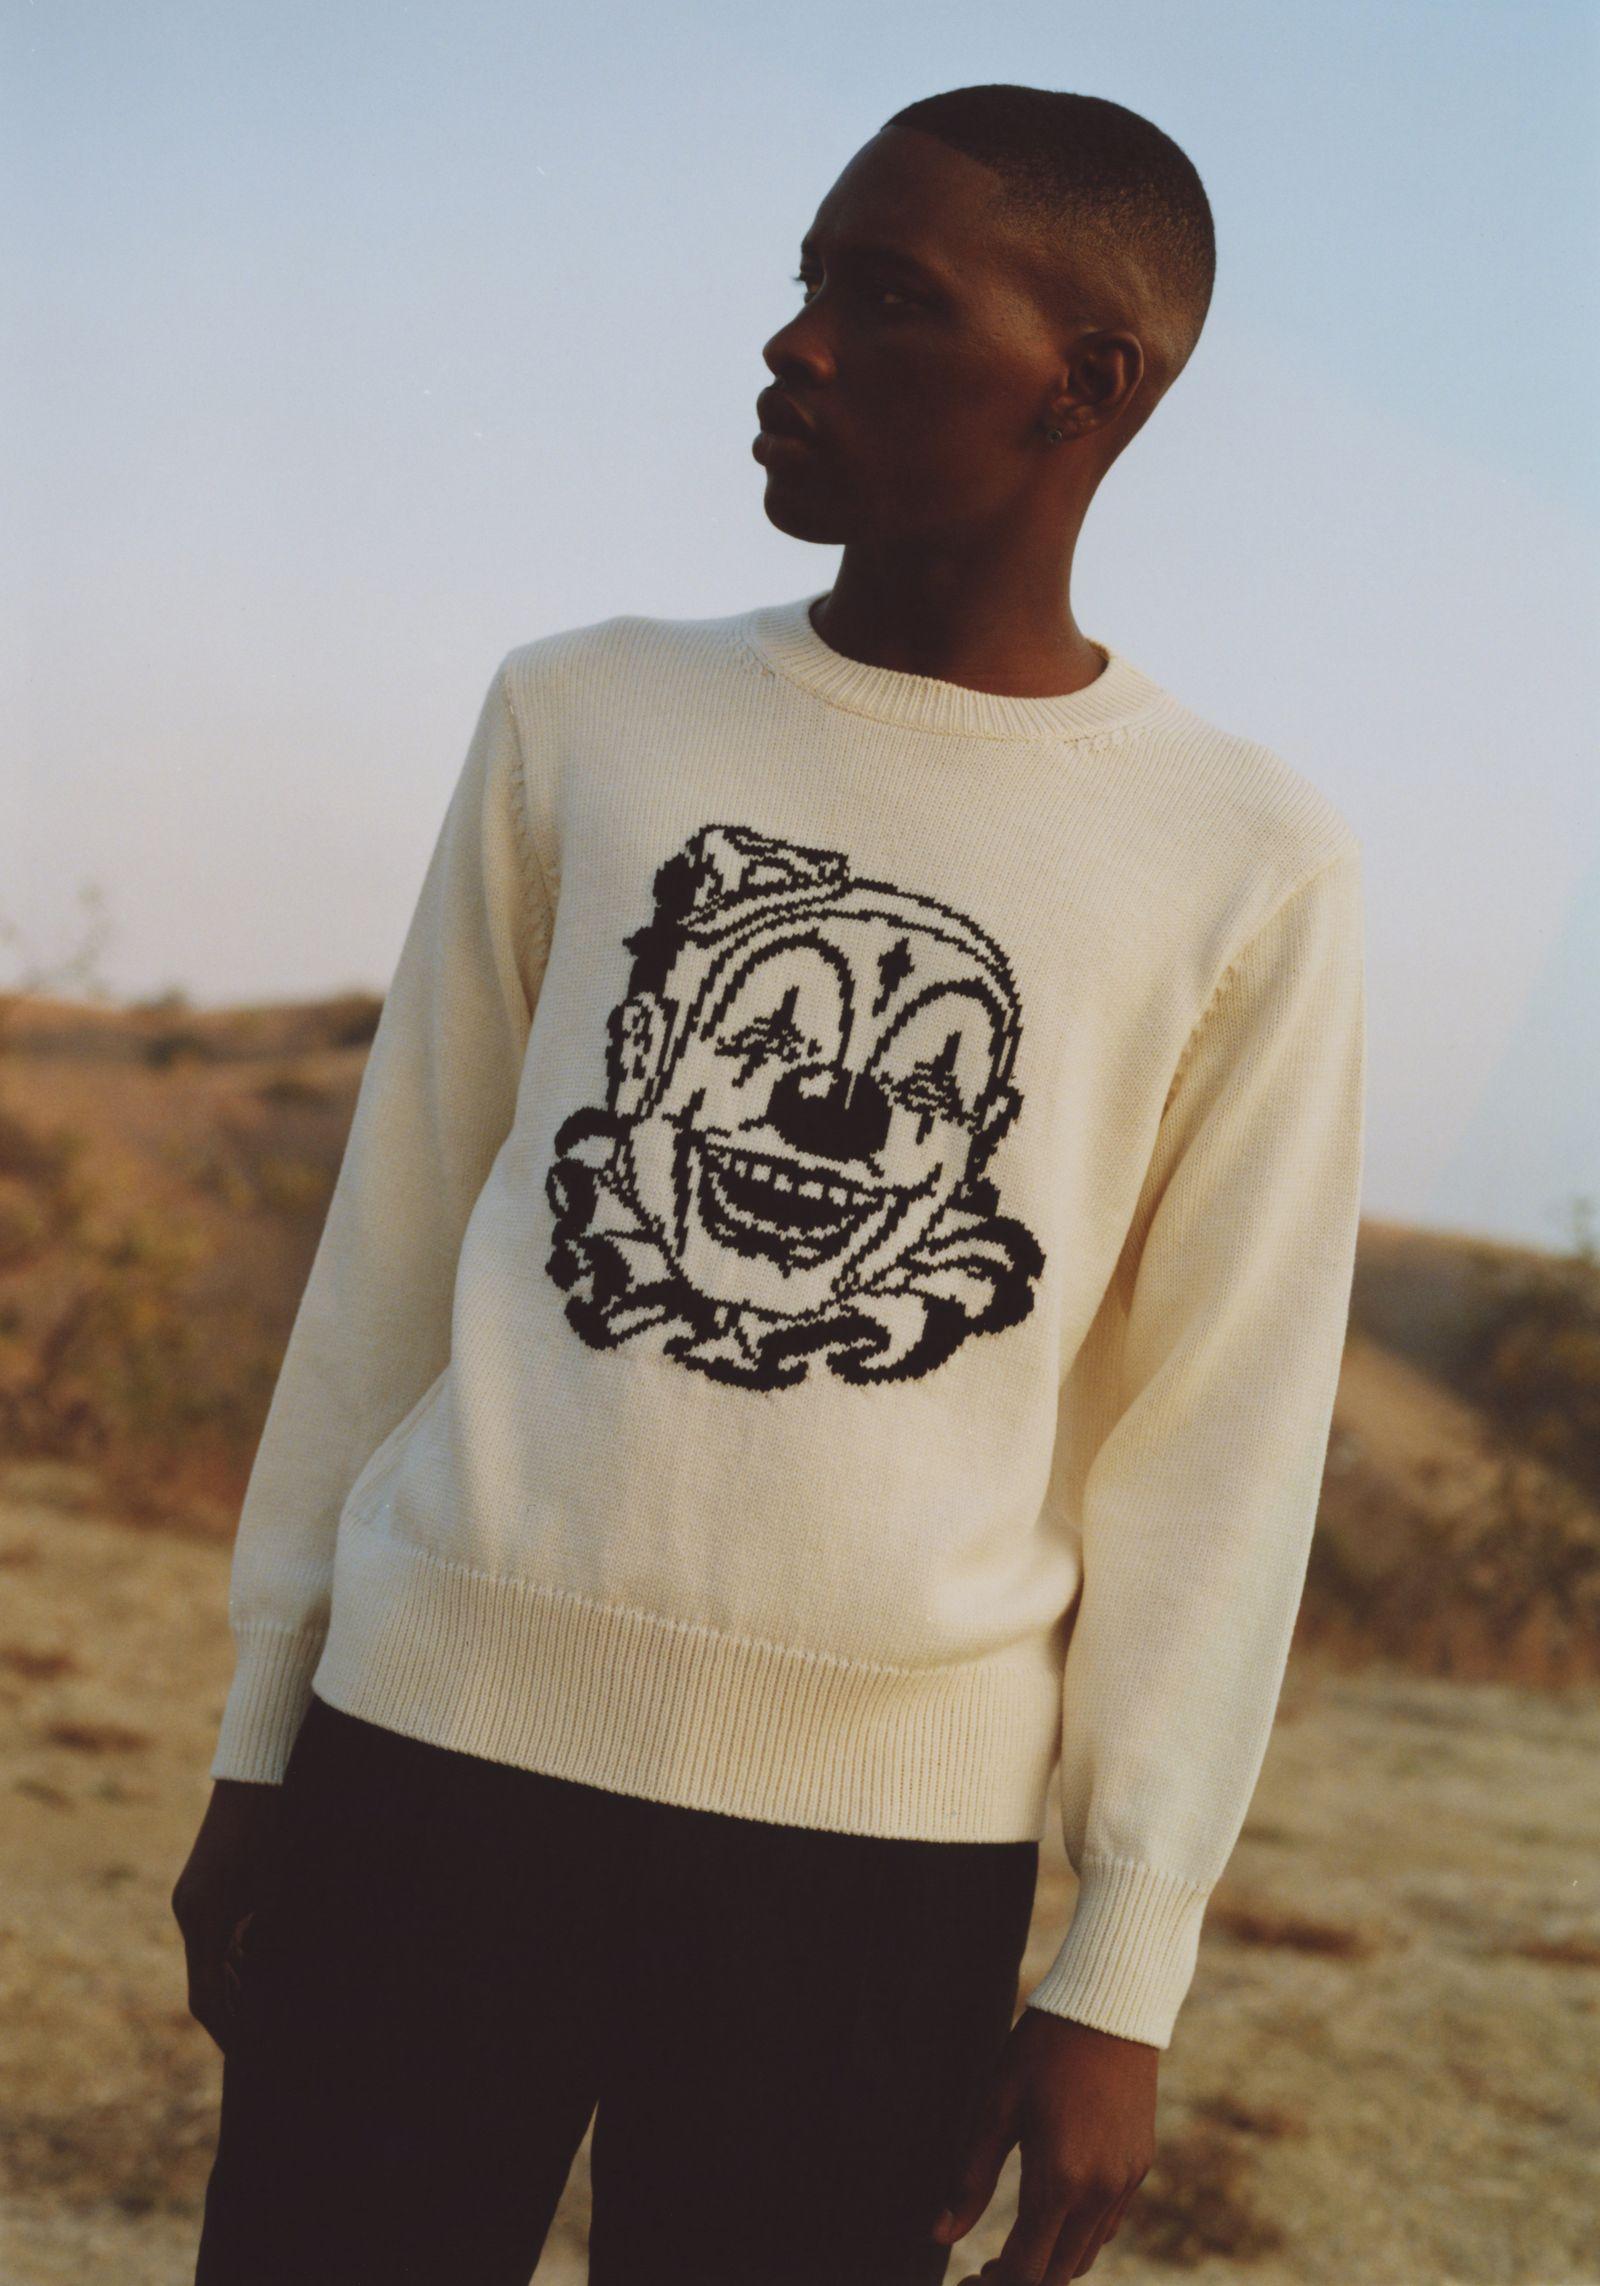 ok ballet knitwear Alex Bortz new brands under the radar